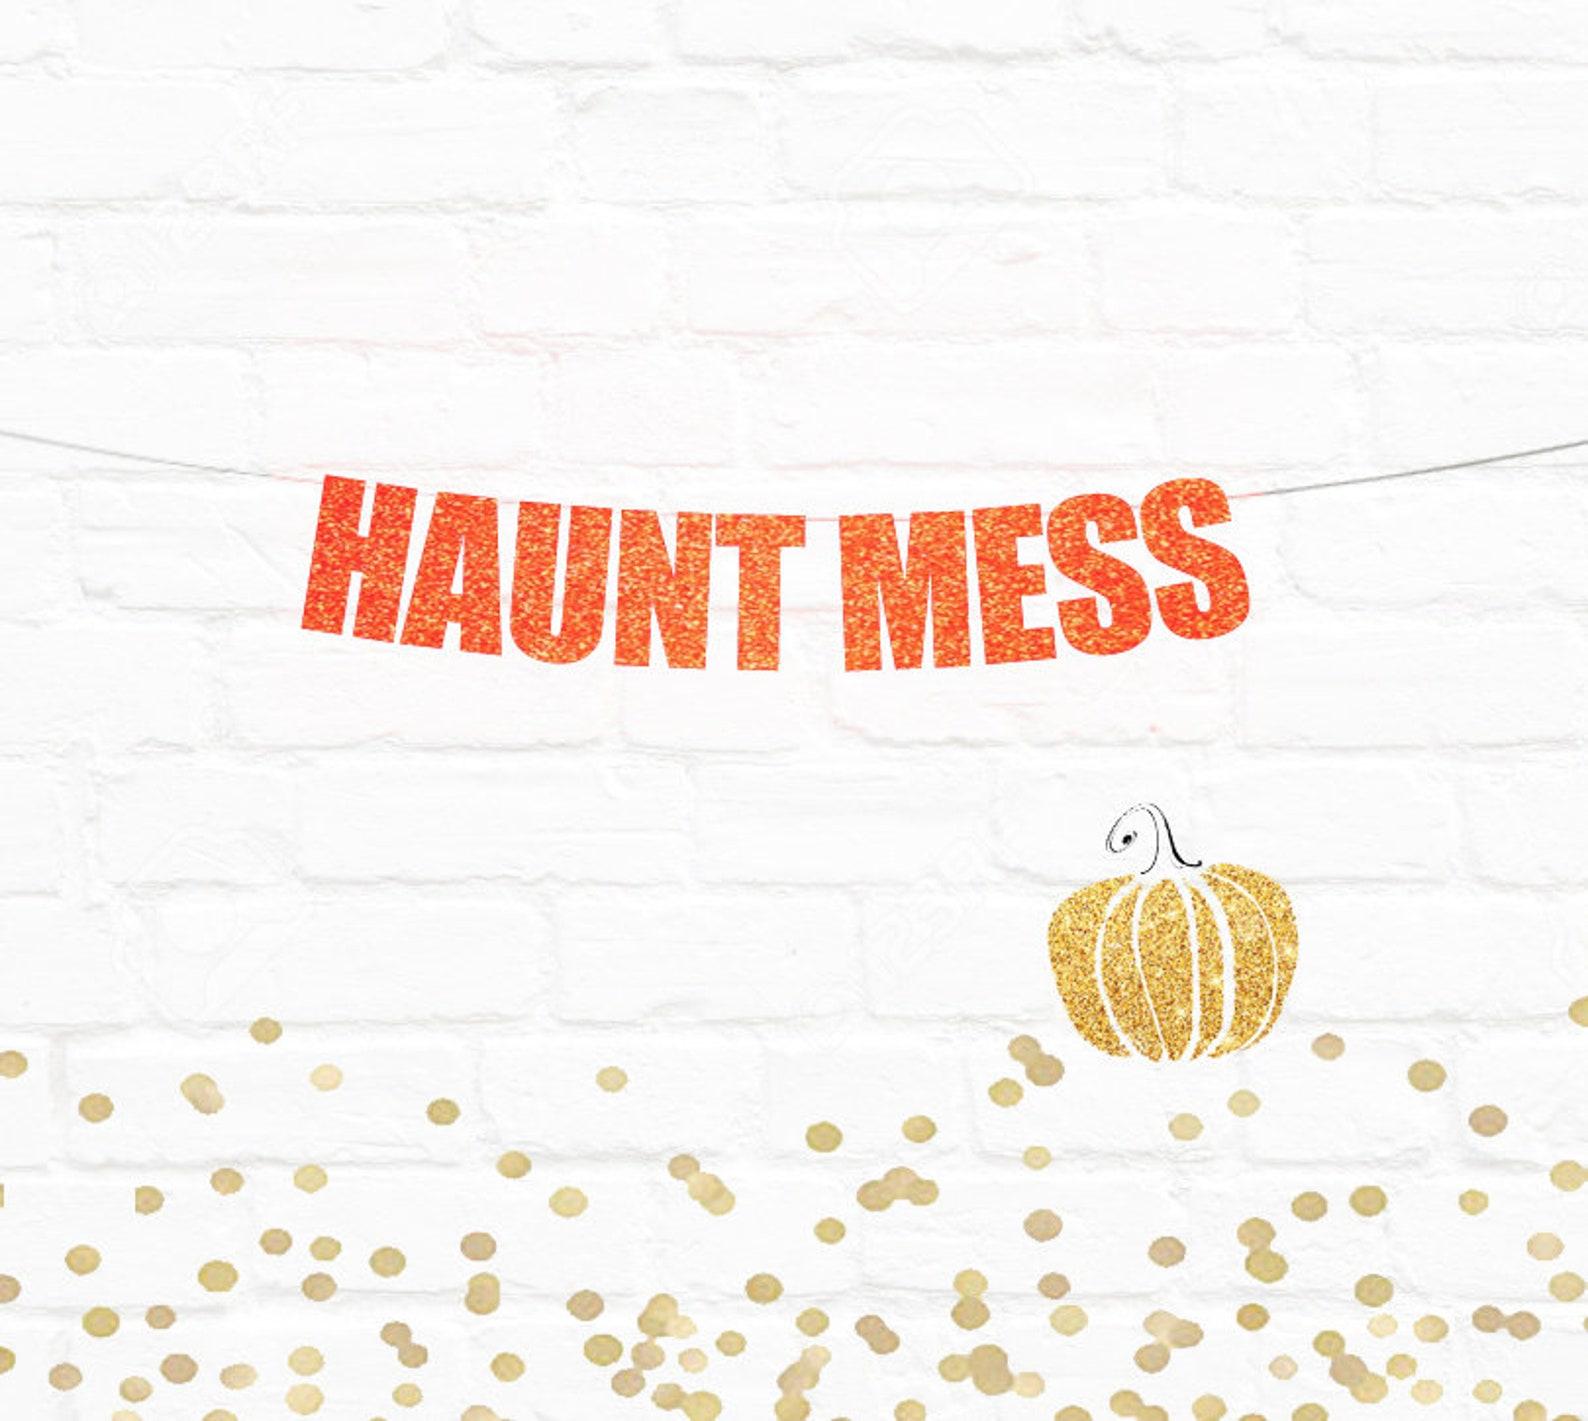 Haunt Mess Halloween party banner decorations